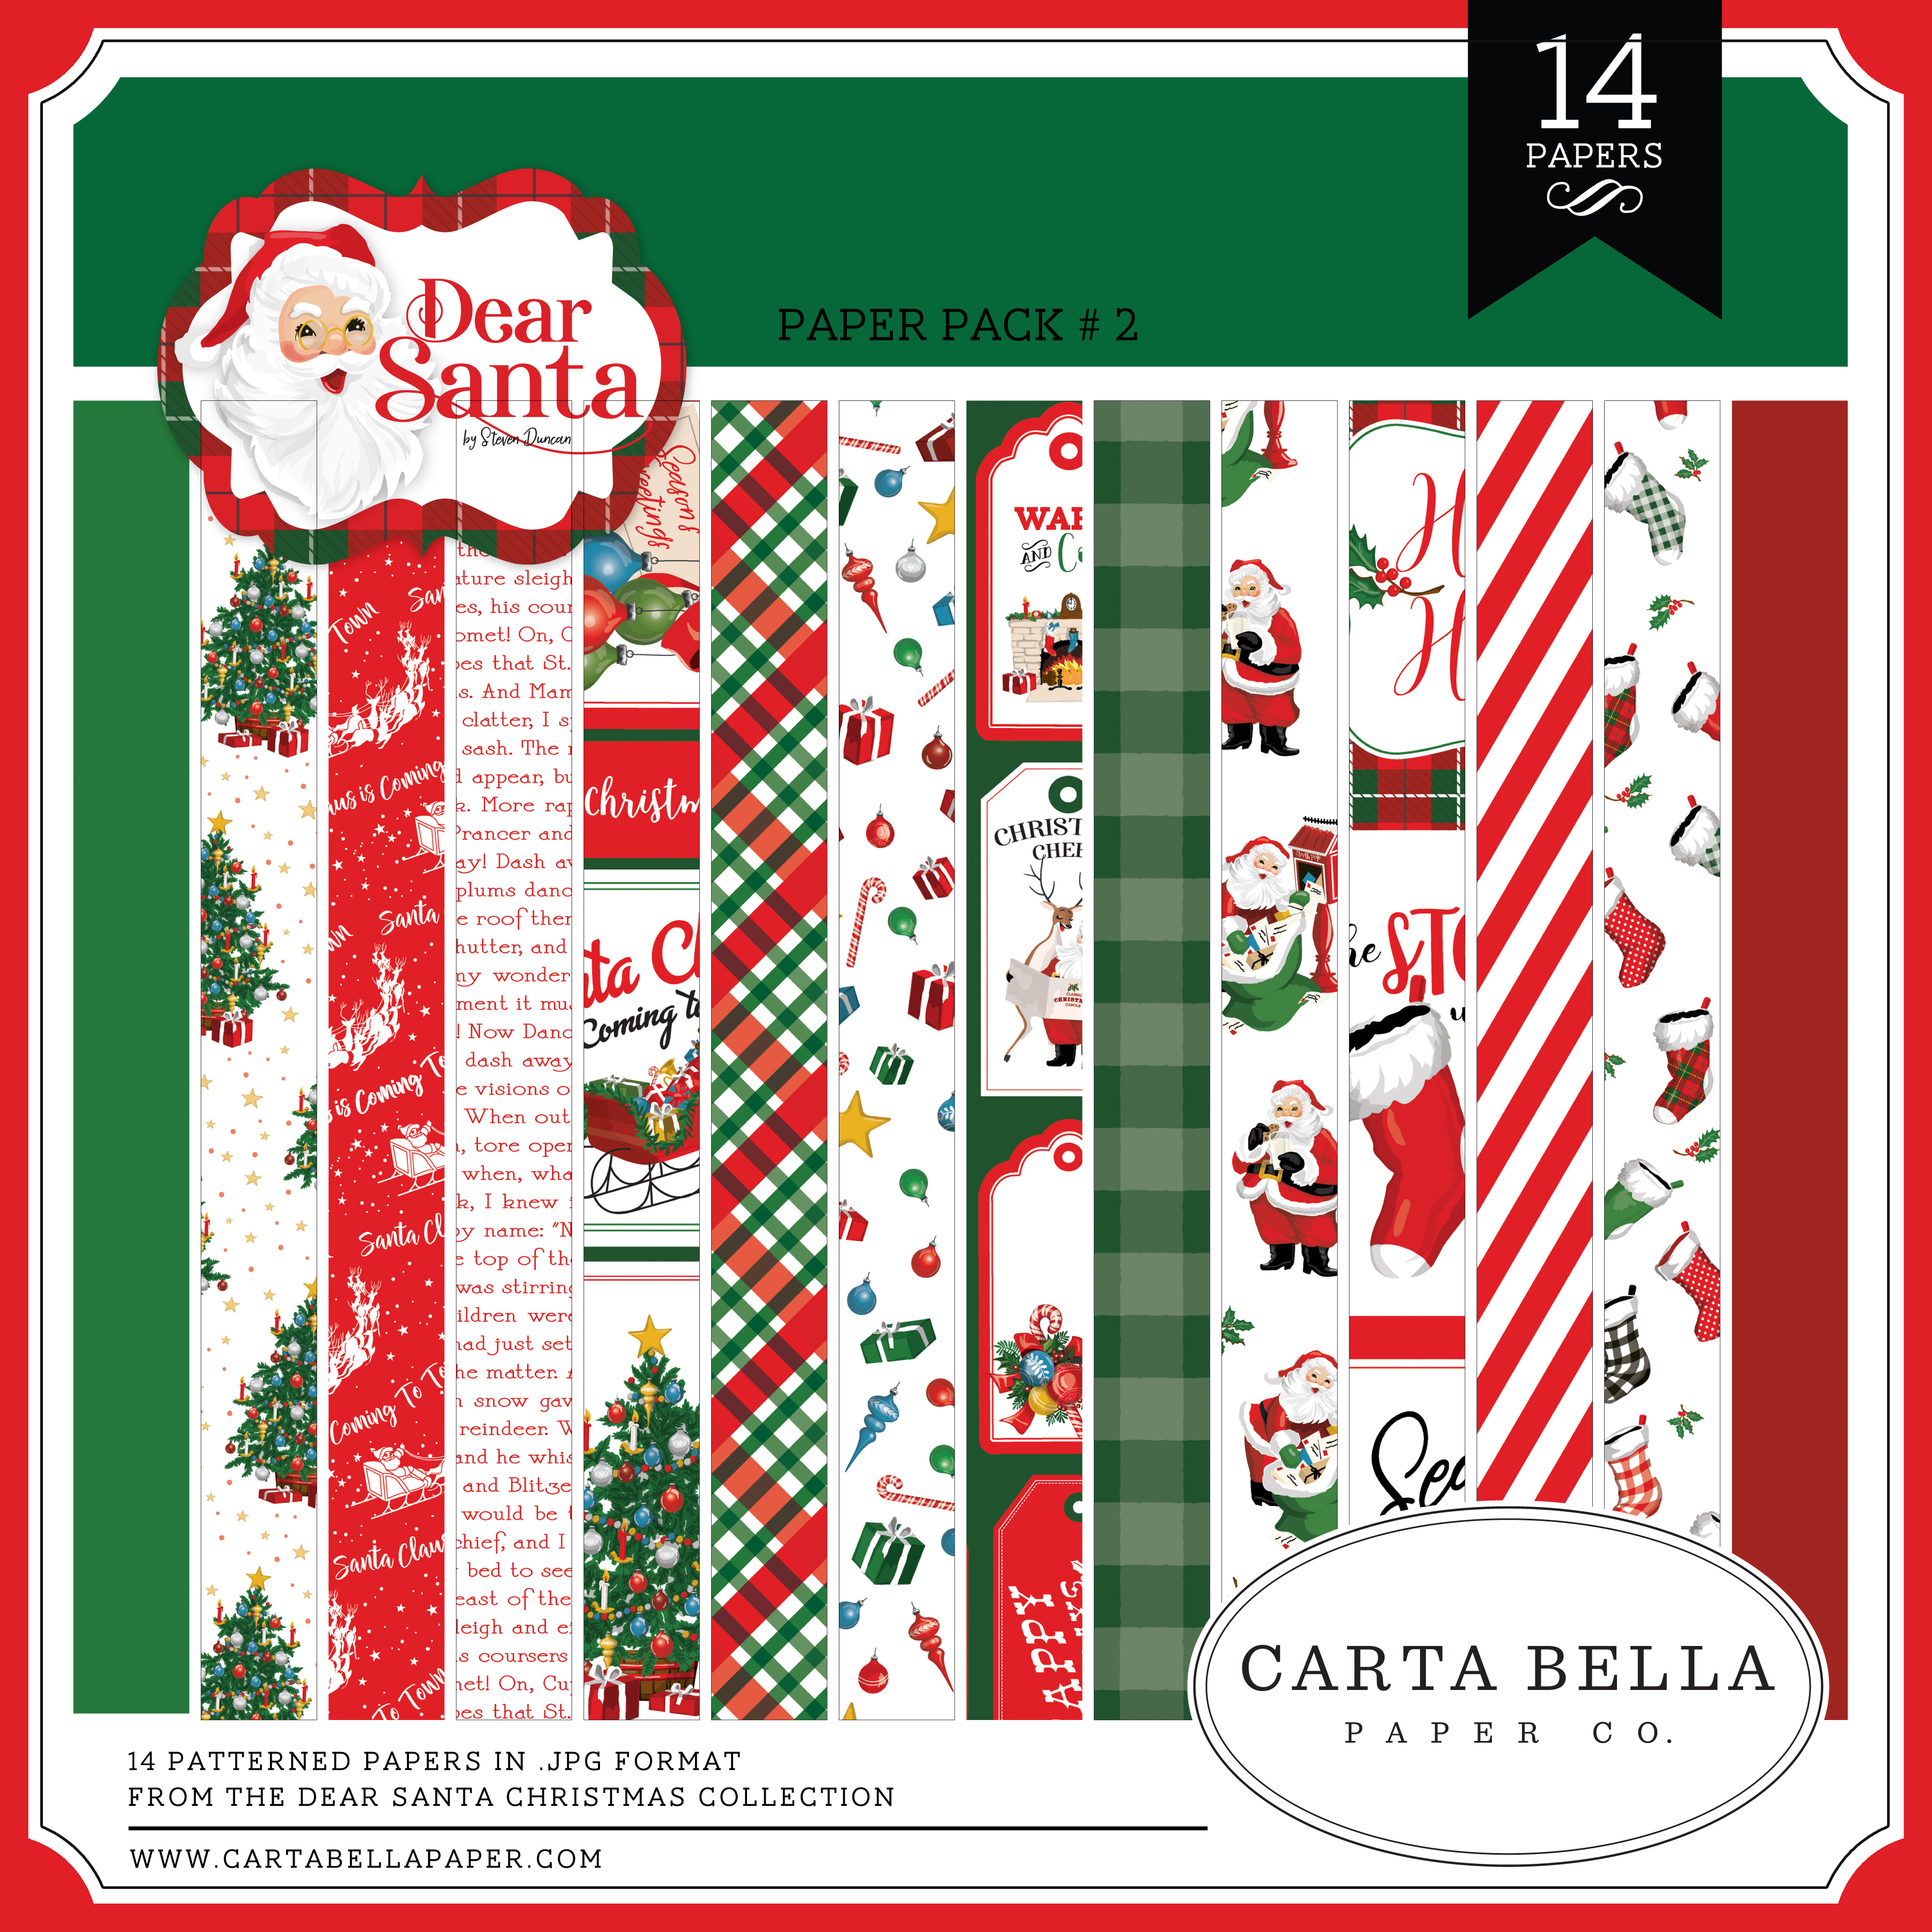 Dear Santa Paper Pack #2